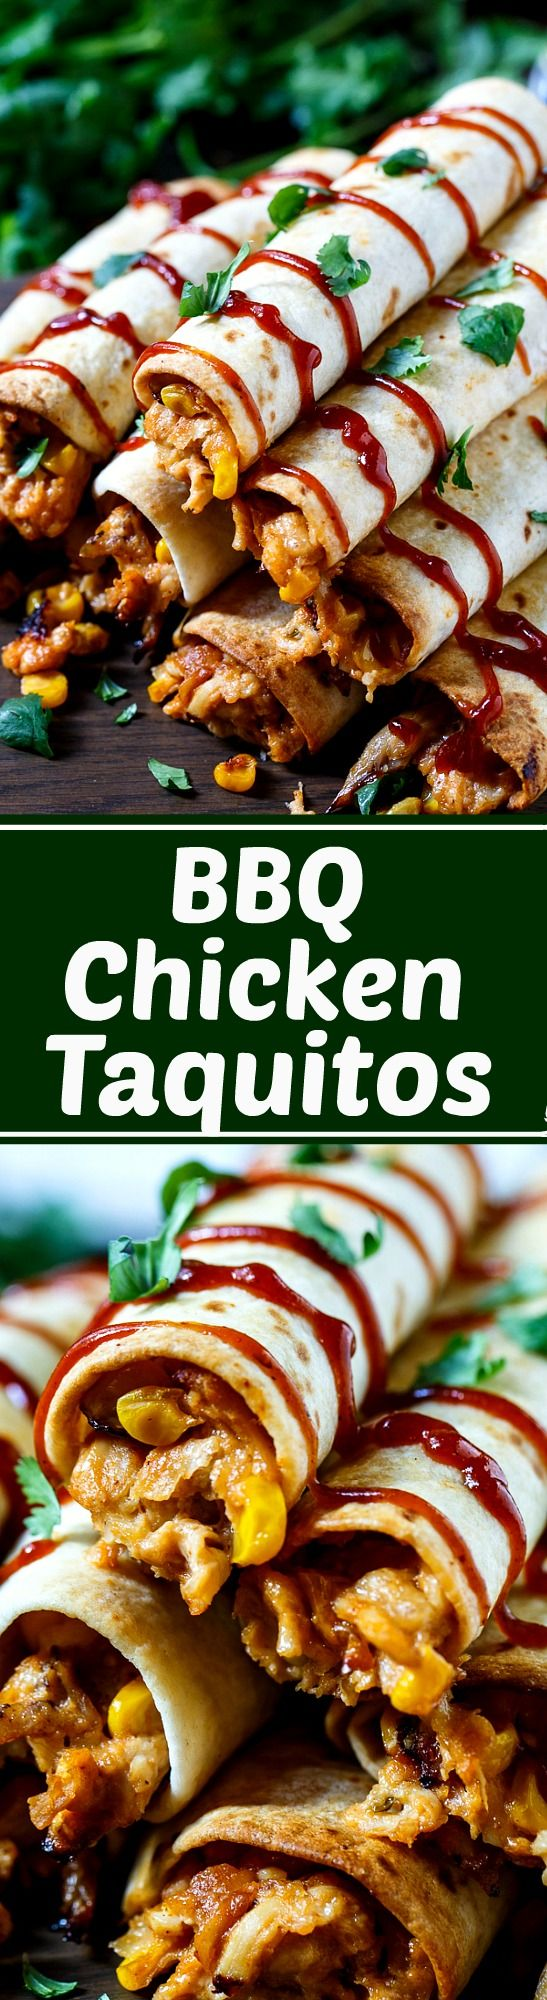 Crispy chicken taquitos recipe